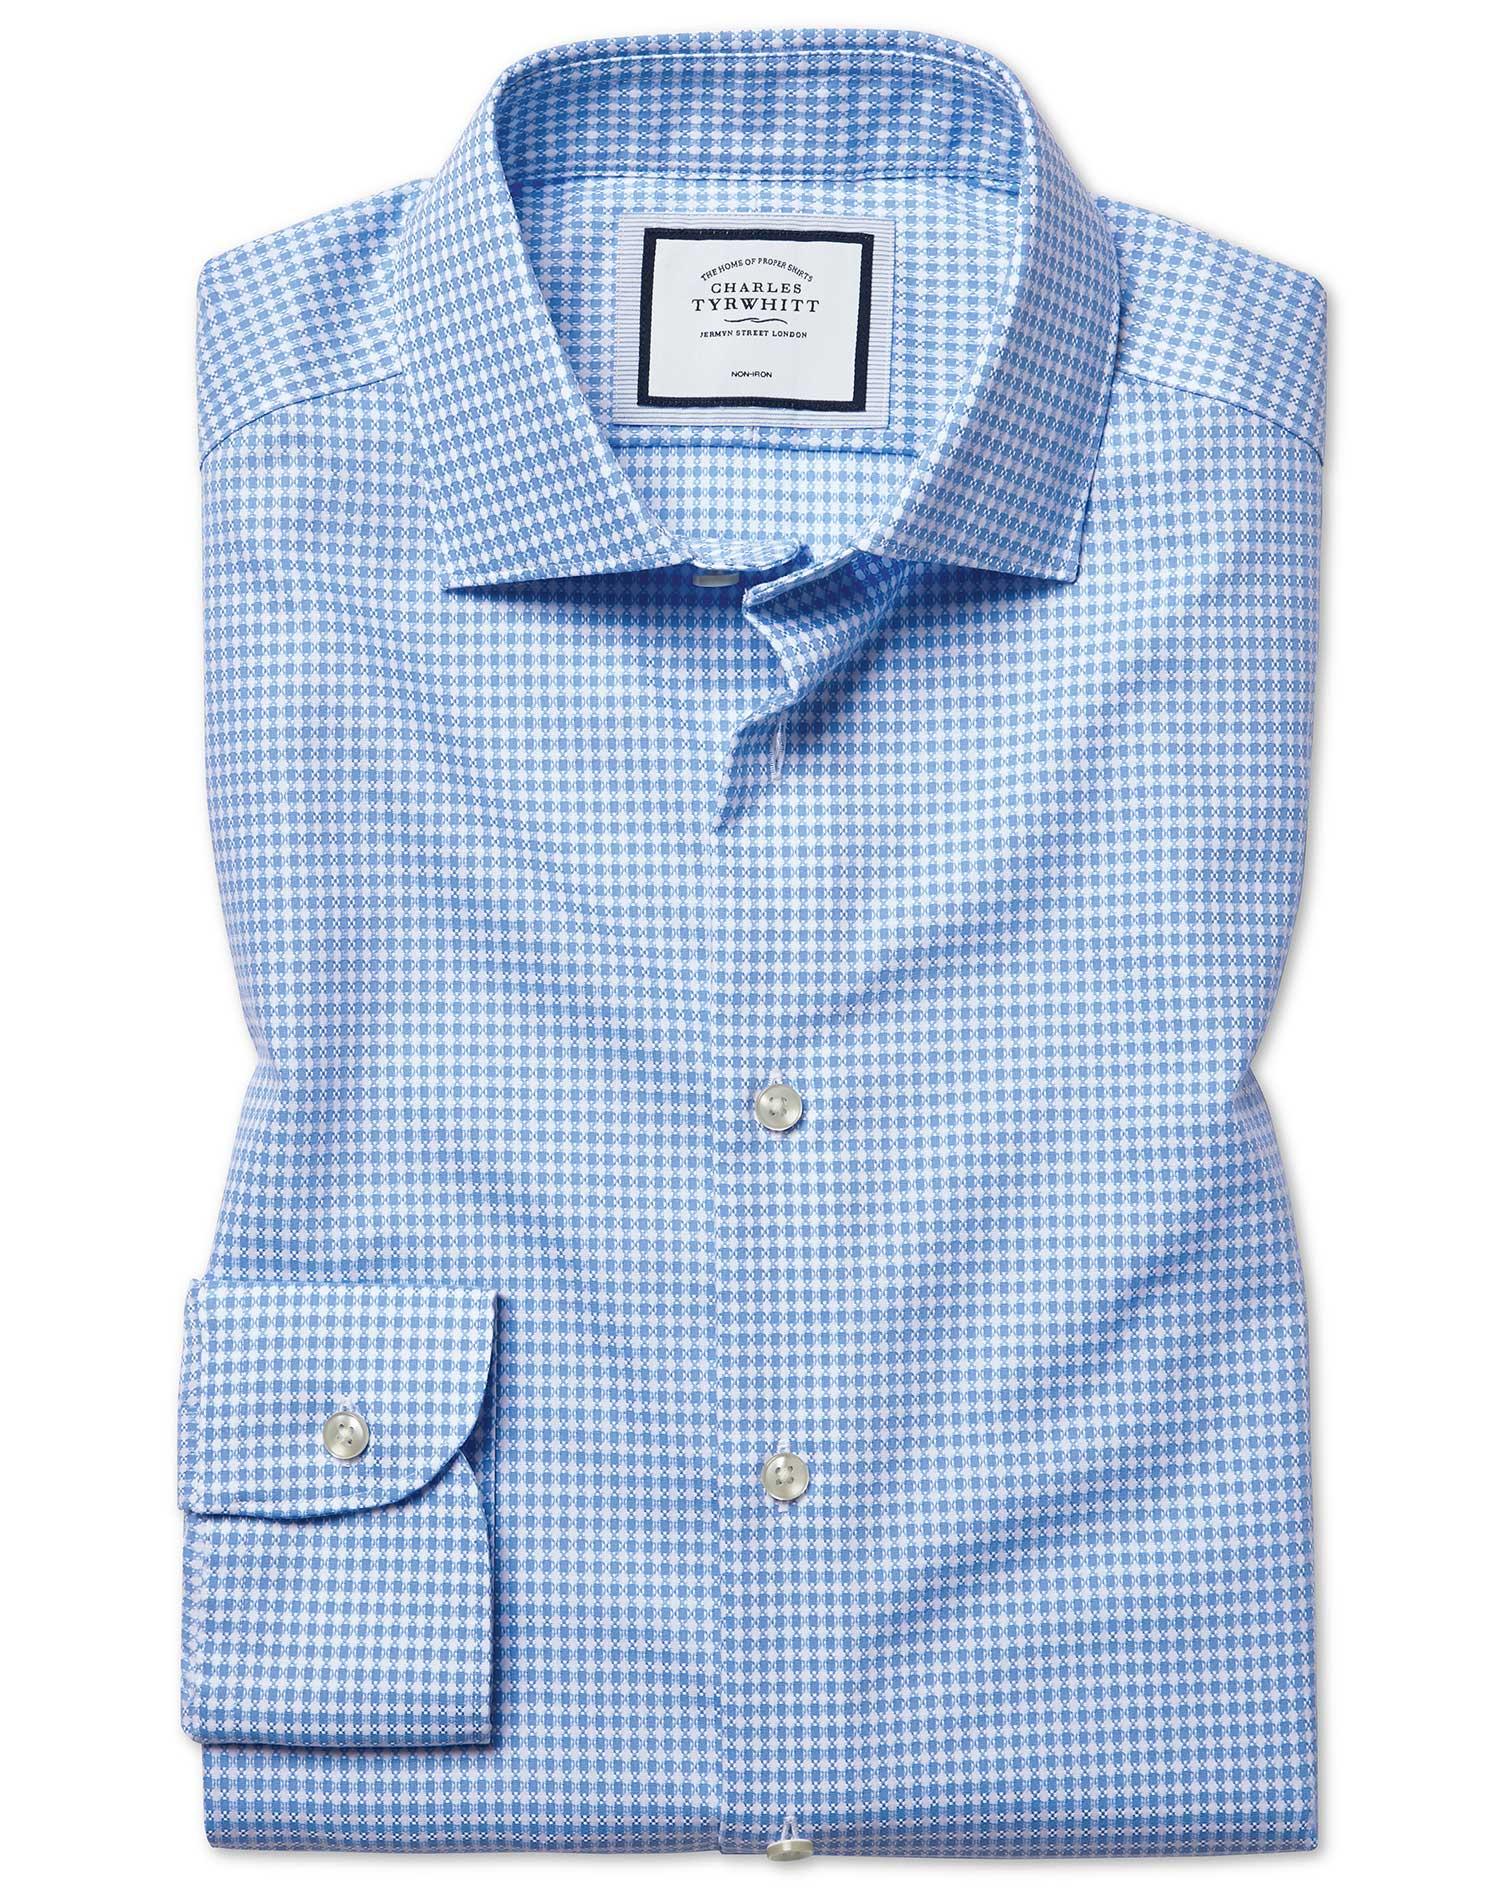 Cotton Extra Slim Fit Non-Iron Natural Stretch Sky Blue Shirt